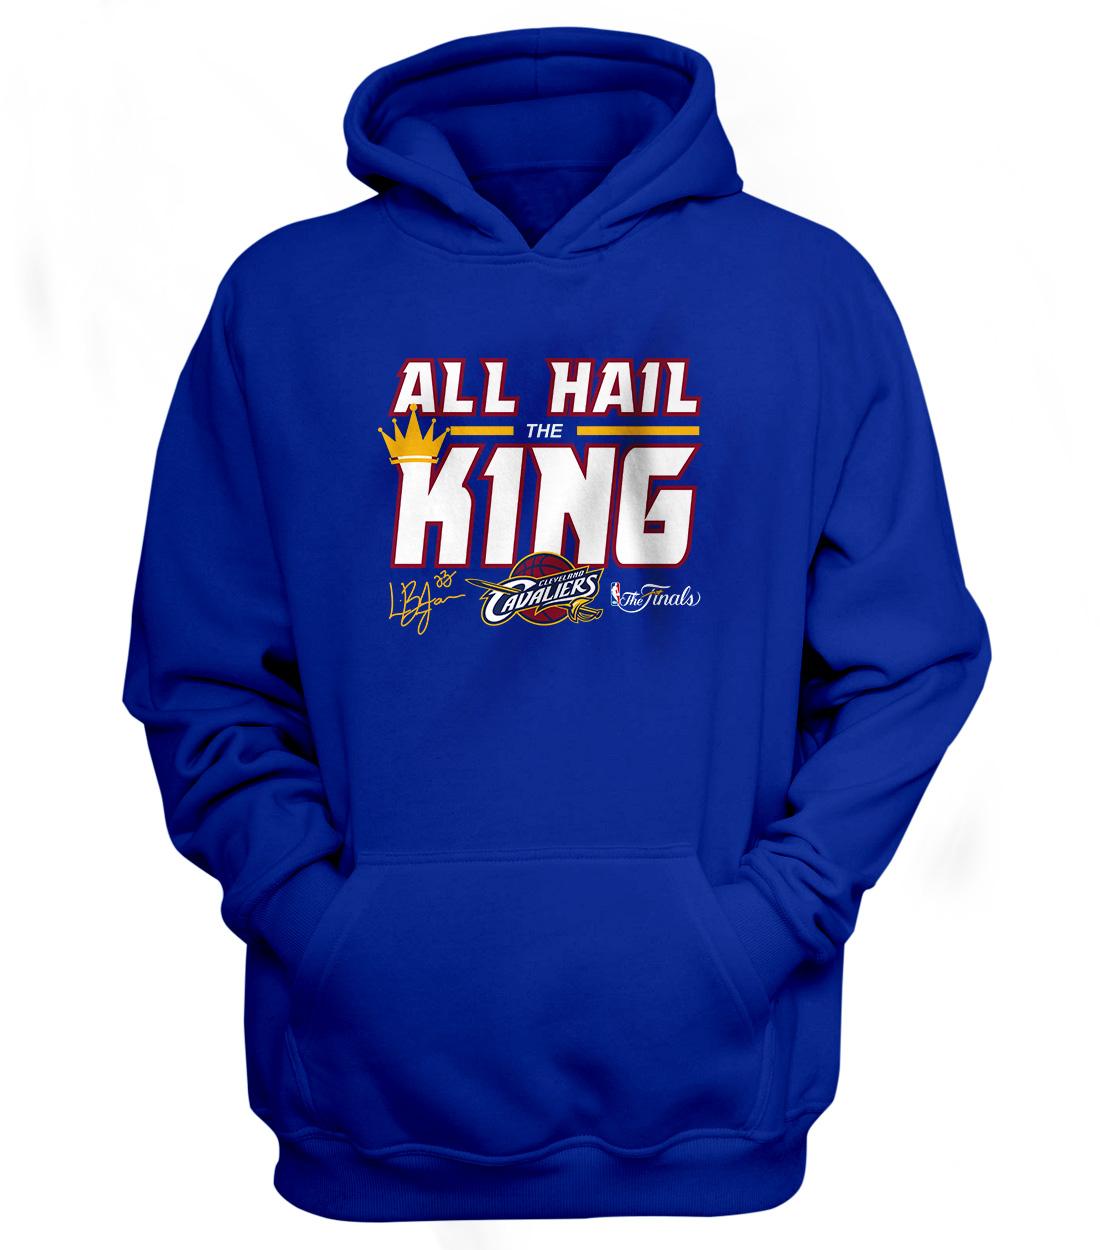 Cleveland Cavaliers 'All Hail The King' Hoodie (HD-BLU-56-PLYR-CLE-ALL.HAIL)